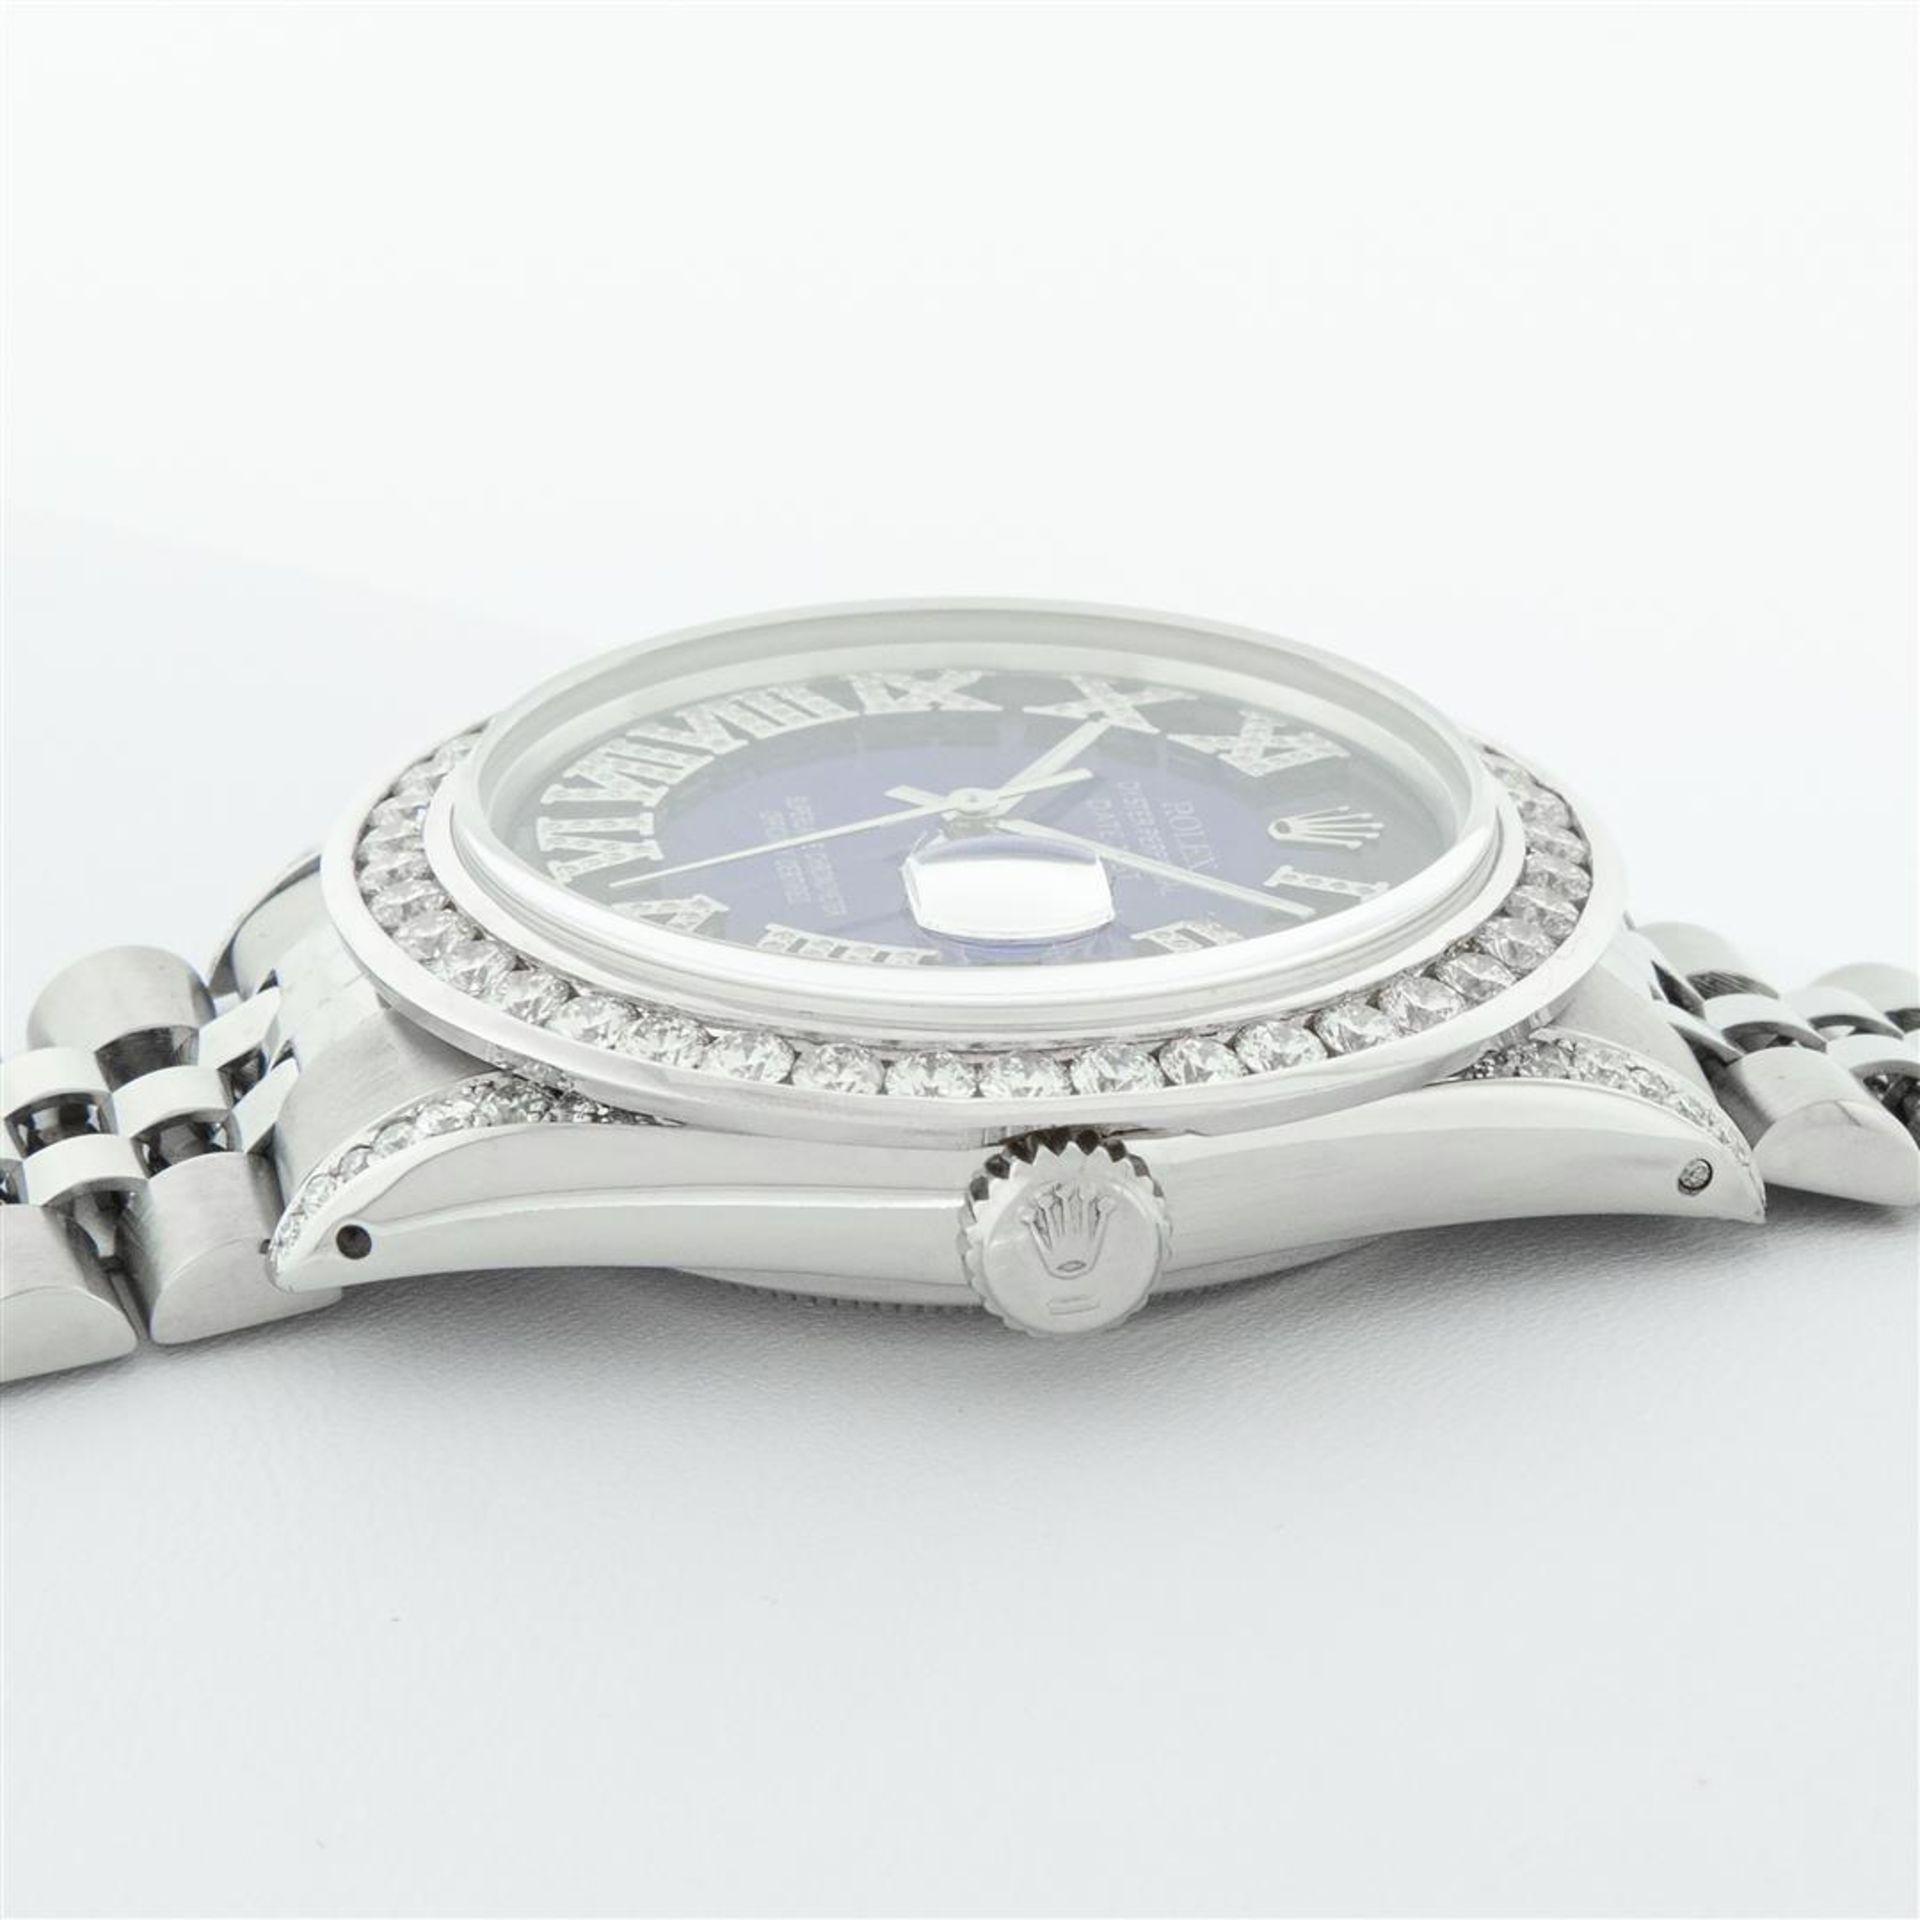 Rolex Mens Stainless Steel Blue Vignette Roman 3ctw Diamond Datejust Wristwatch - Image 5 of 9